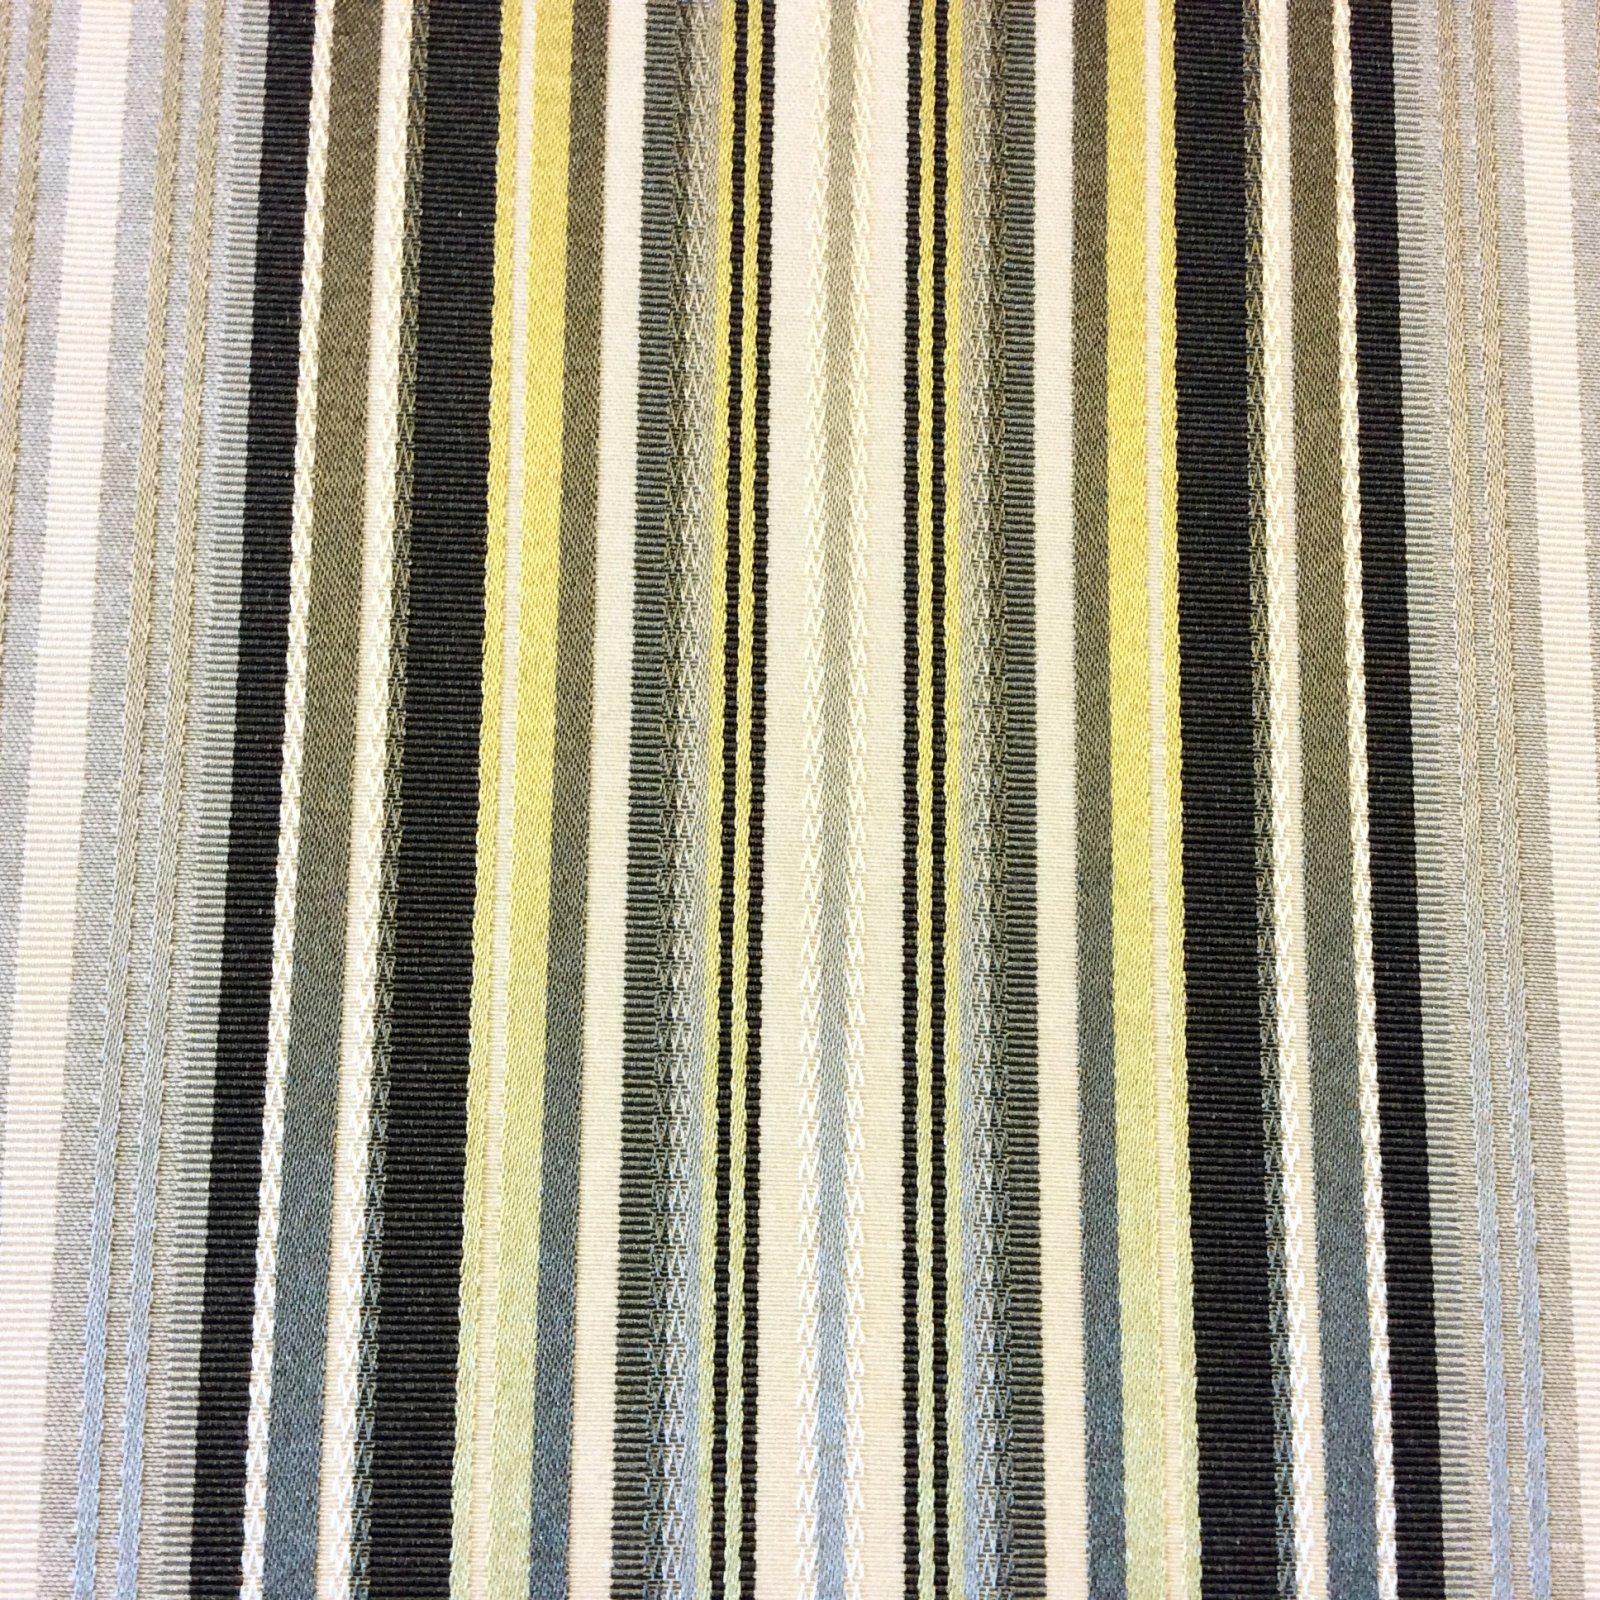 Stripe Citron Grey Ivory Modern Heavy Woven Tapestry Stripe Heavy Weight Upholstery Fabric HDA012